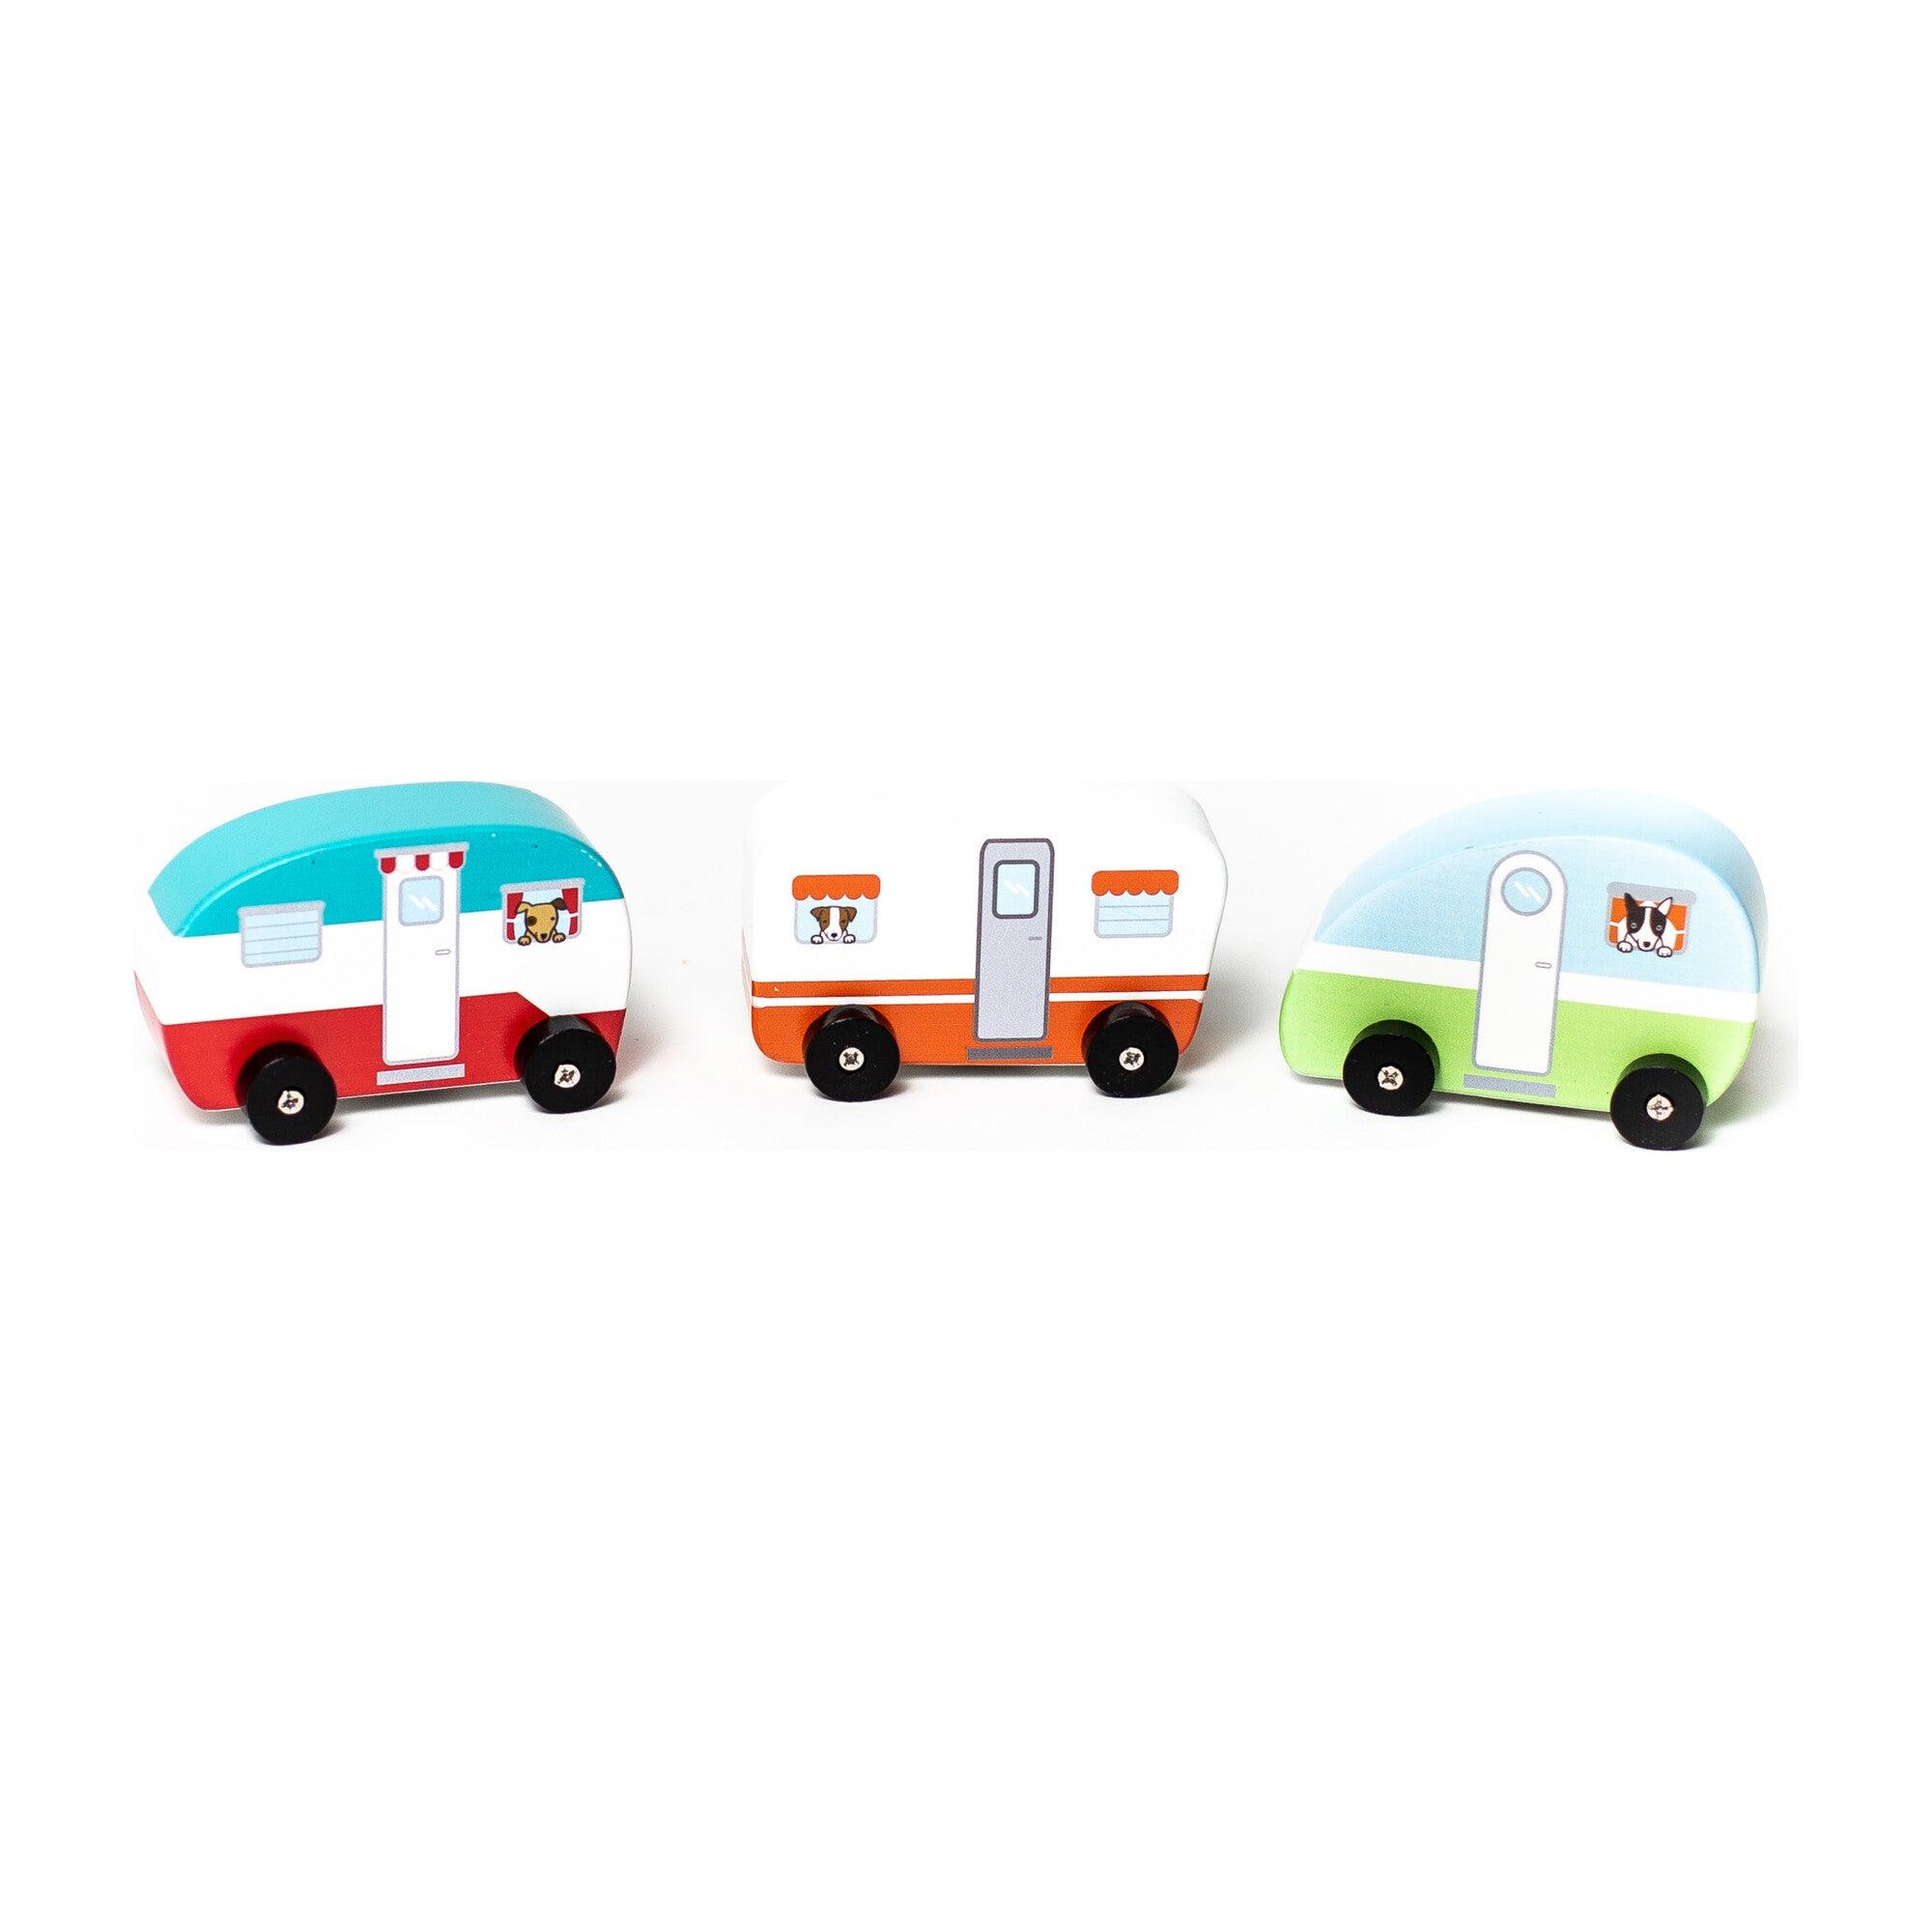 Mini Vintage Campers, Set of 3